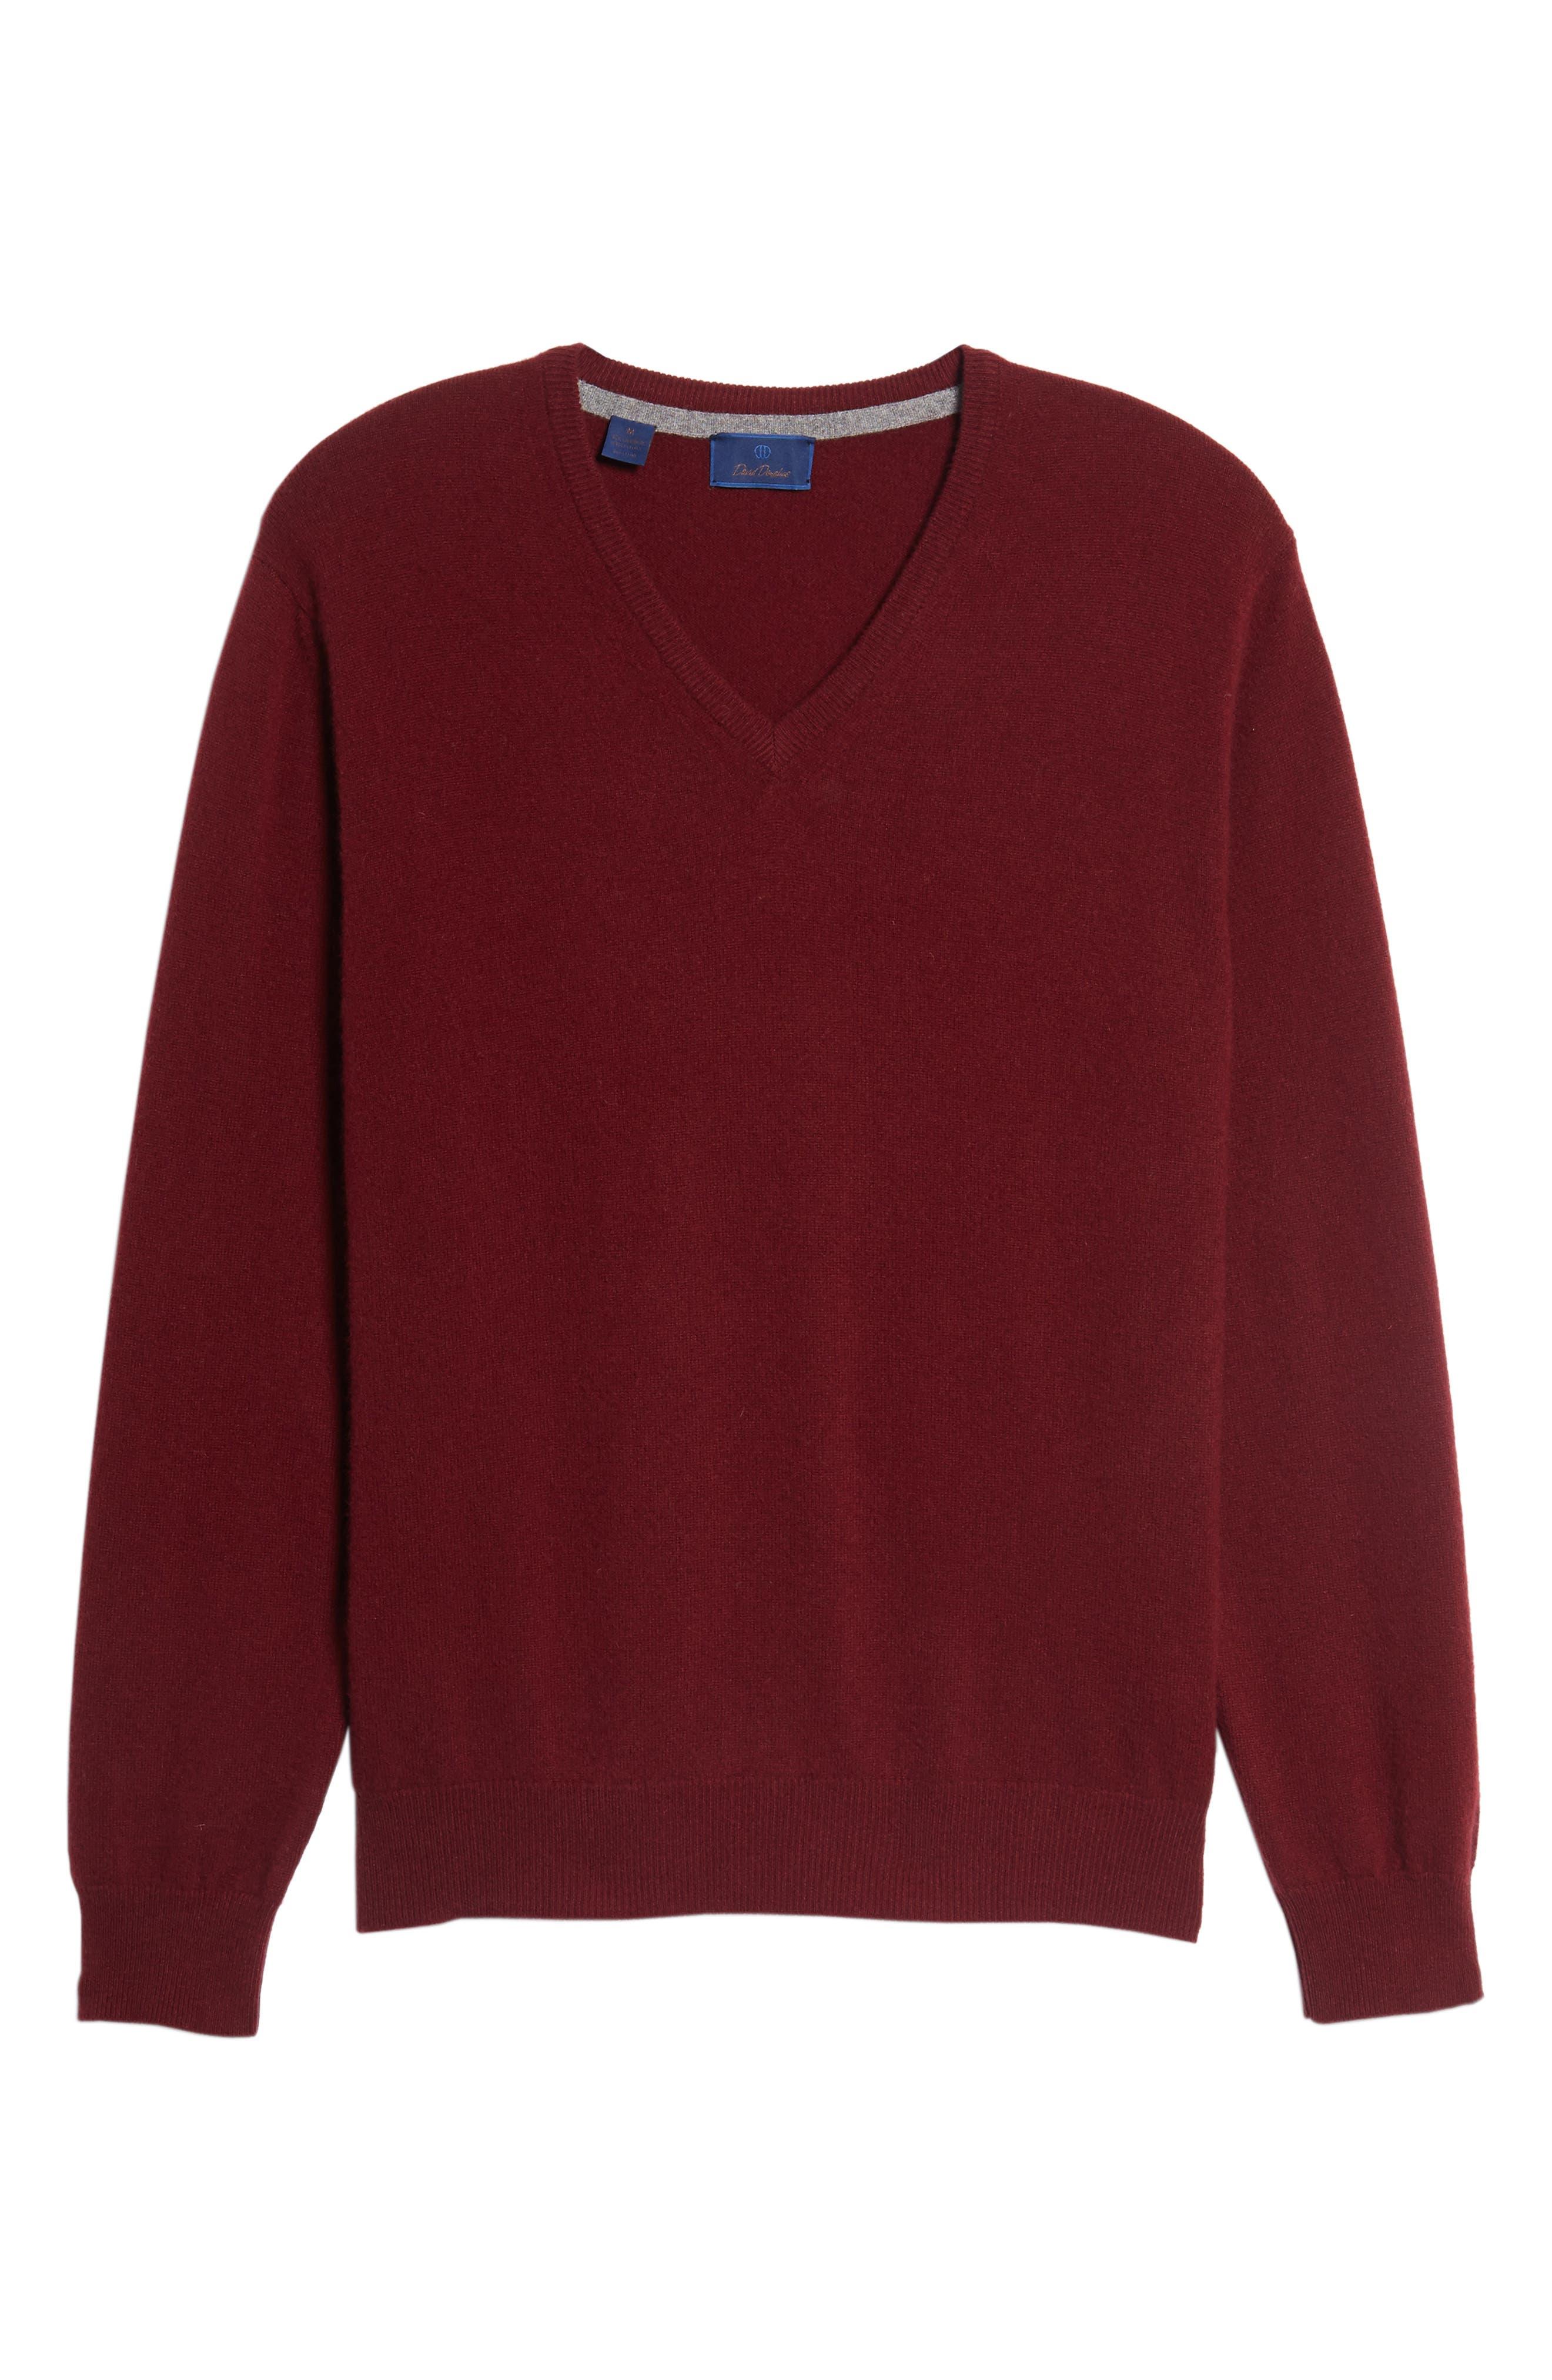 Cashmere V-Neck Sweater,                             Alternate thumbnail 36, color,